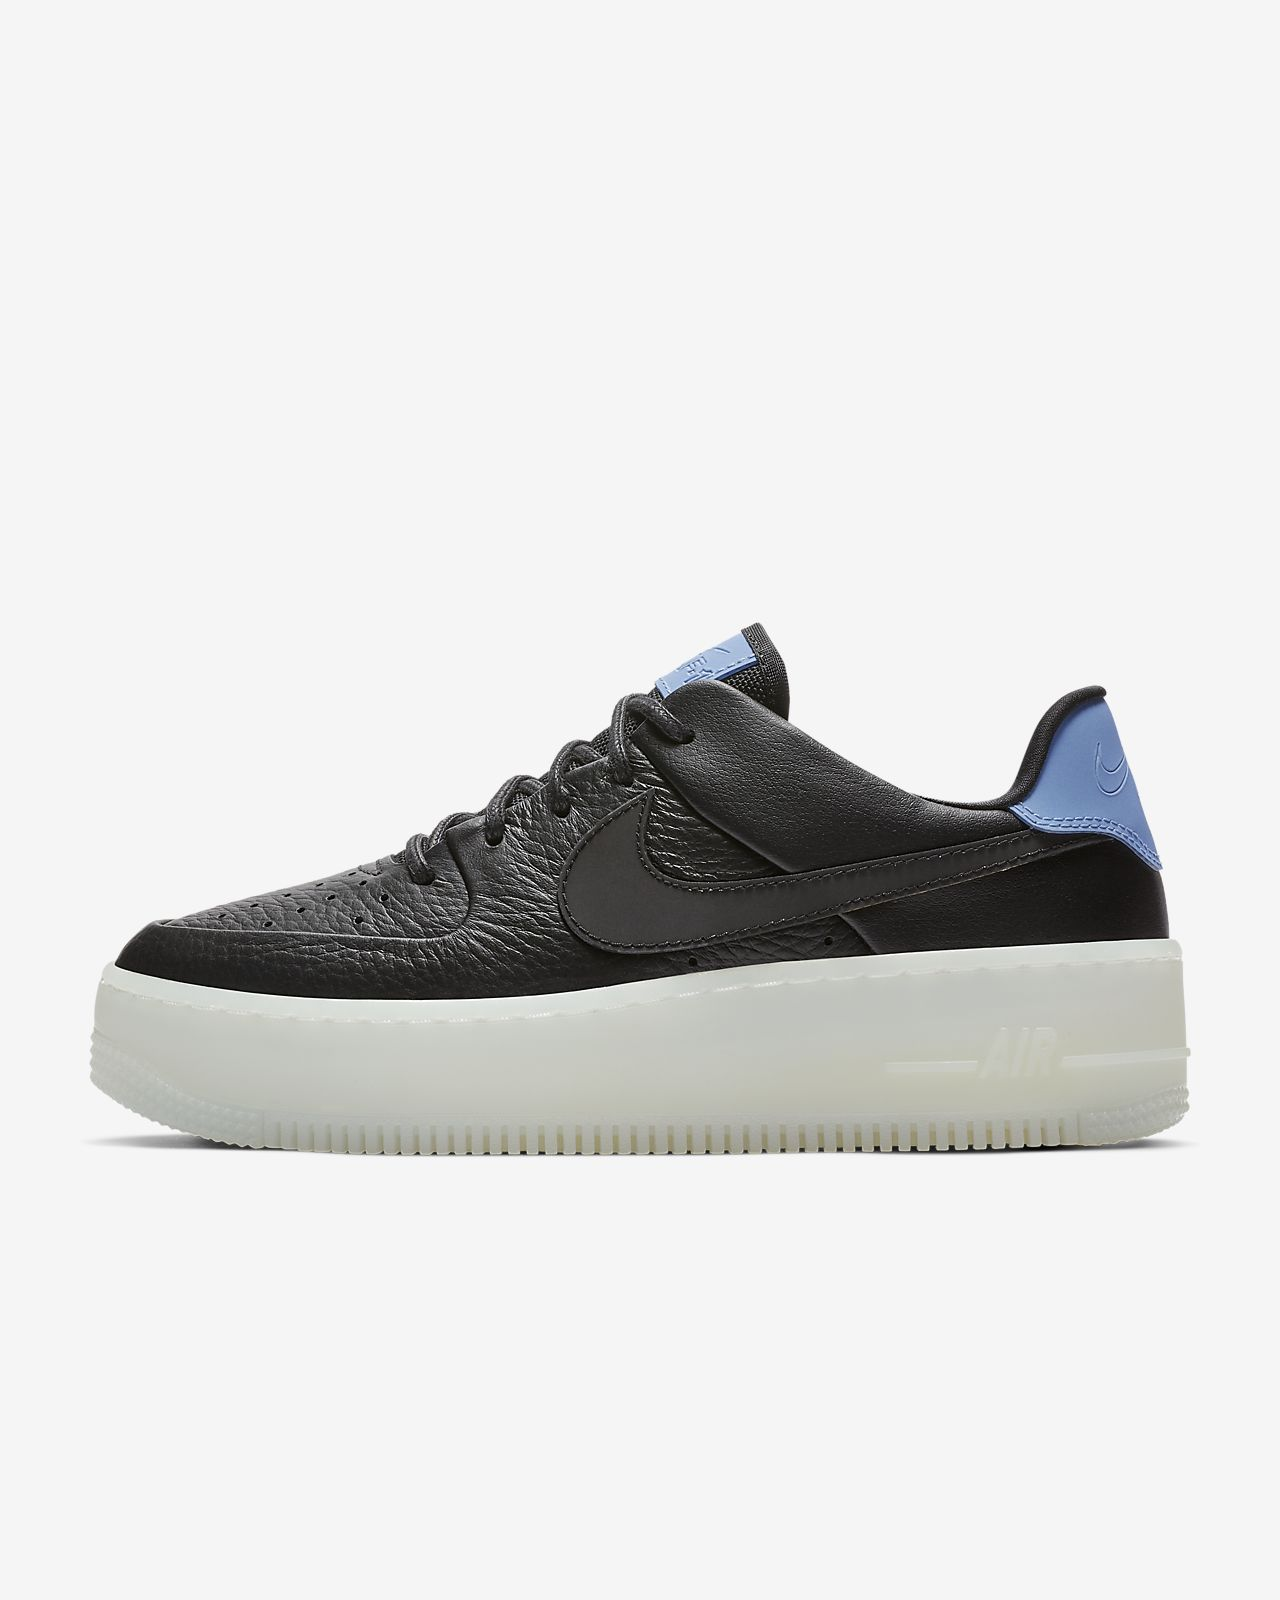 Dámská bota Nike Air Force 1 Sage Low LX